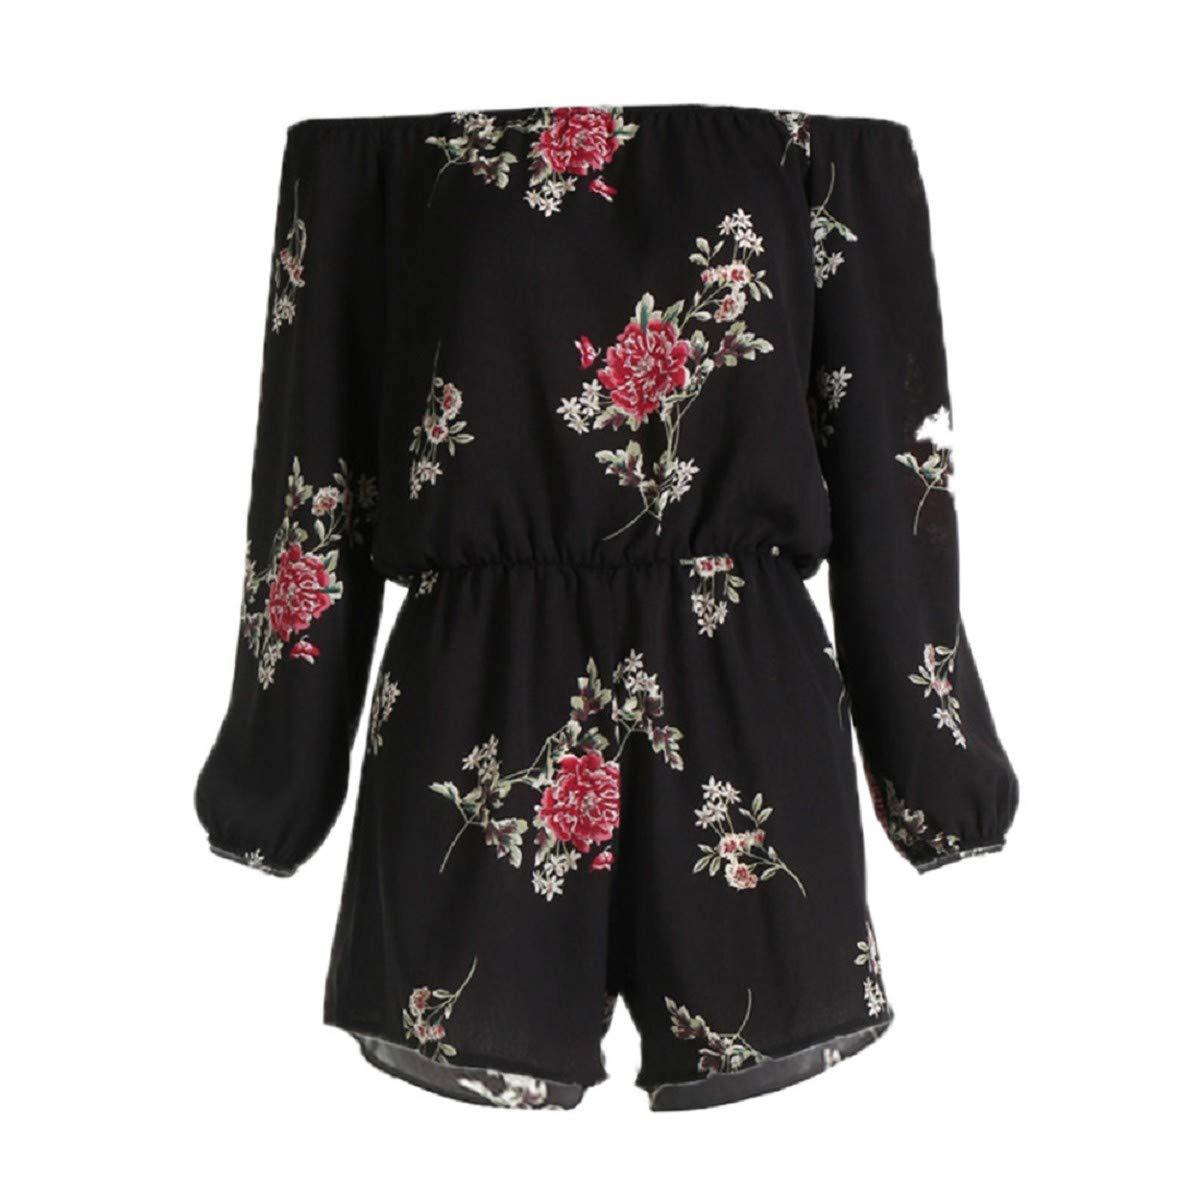 OTINICE Women Long Sleeve Jumpsuit Summer Floral Off Shoulder Backless Loose Party Short Rompers Black